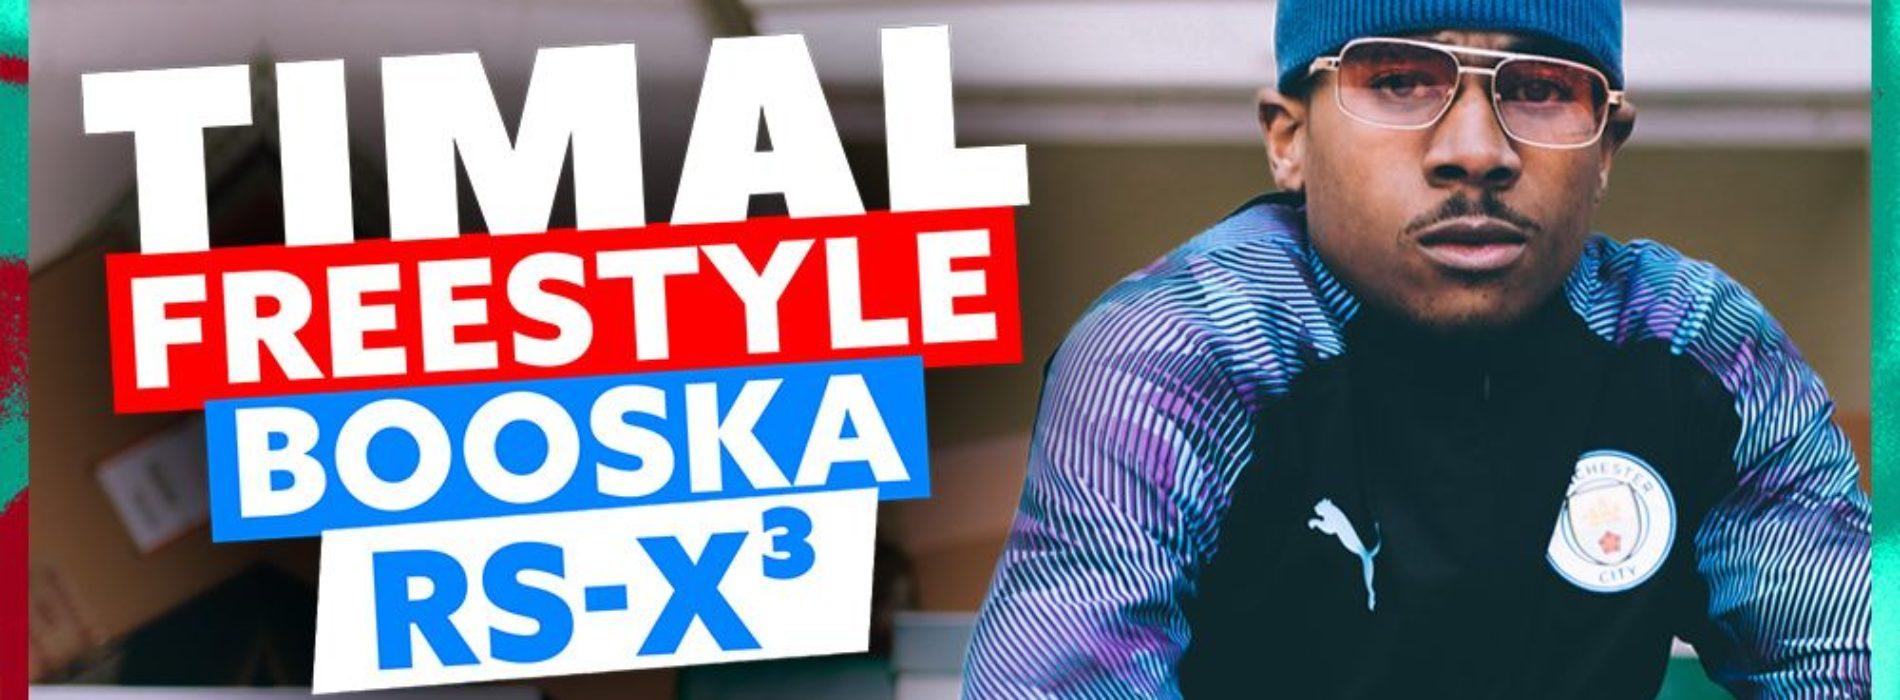 Timal   Freestyle Booska RS-X³ – Février 2020